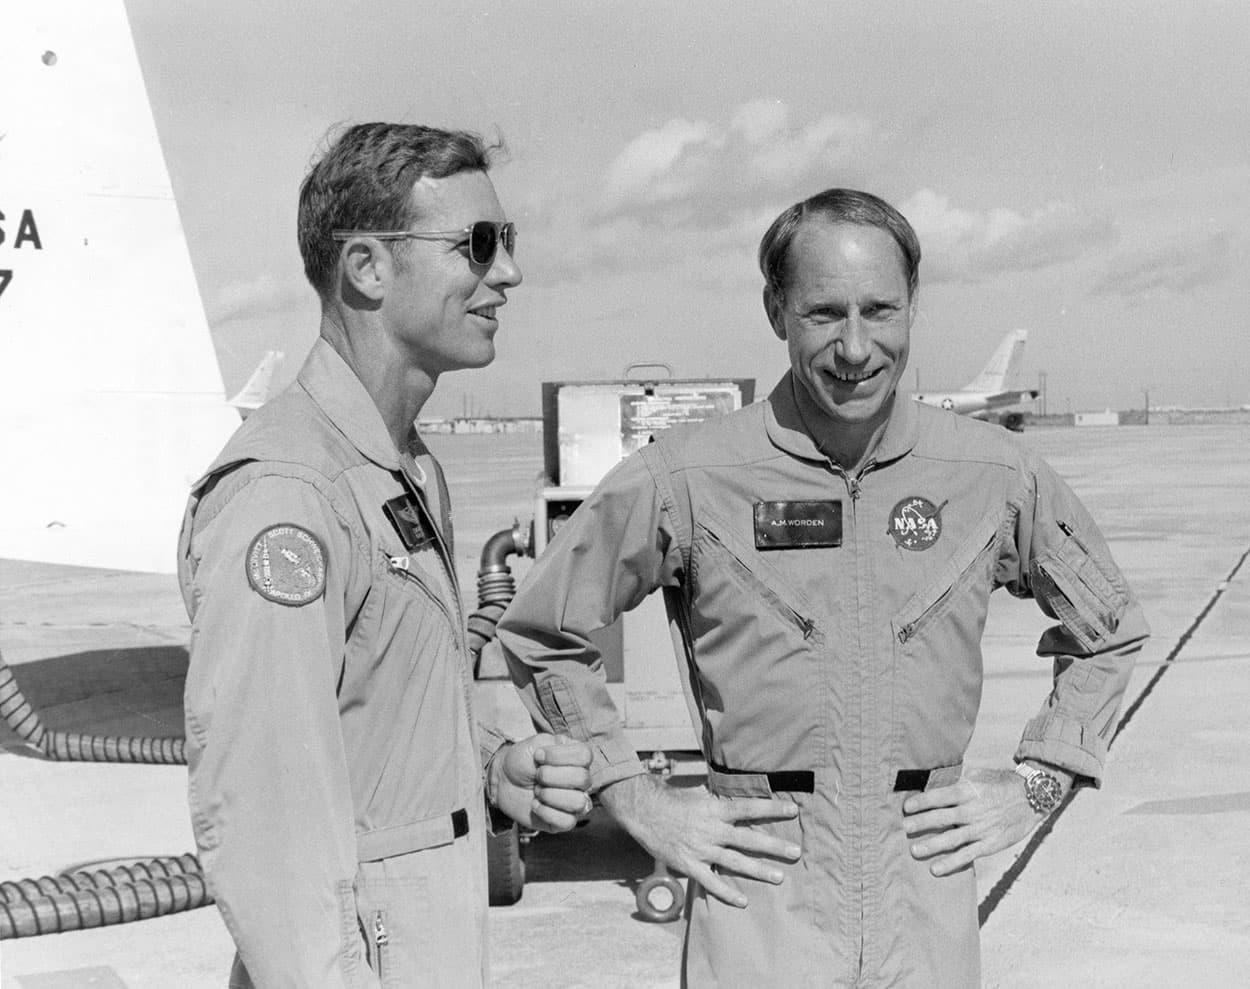 Fratello Watches Q Amp A With Apollo 15 Astronaut Dave Scott